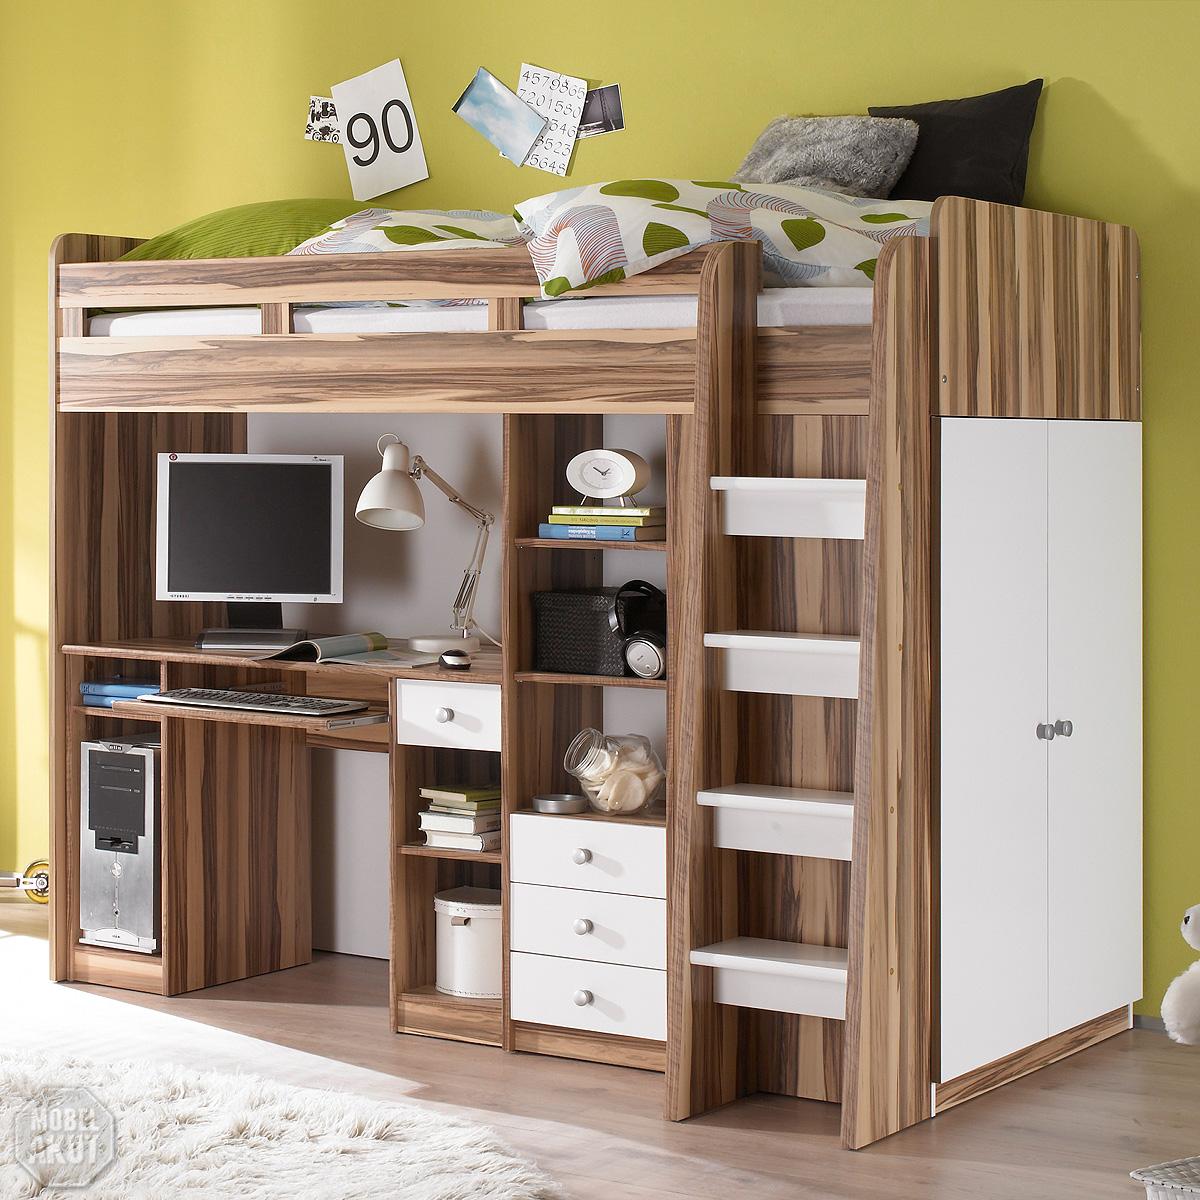 hochbett 200 x 200 hochbett 180 200 haus m bel hochbett 180x200 hochbett andreas buche massiv. Black Bedroom Furniture Sets. Home Design Ideas